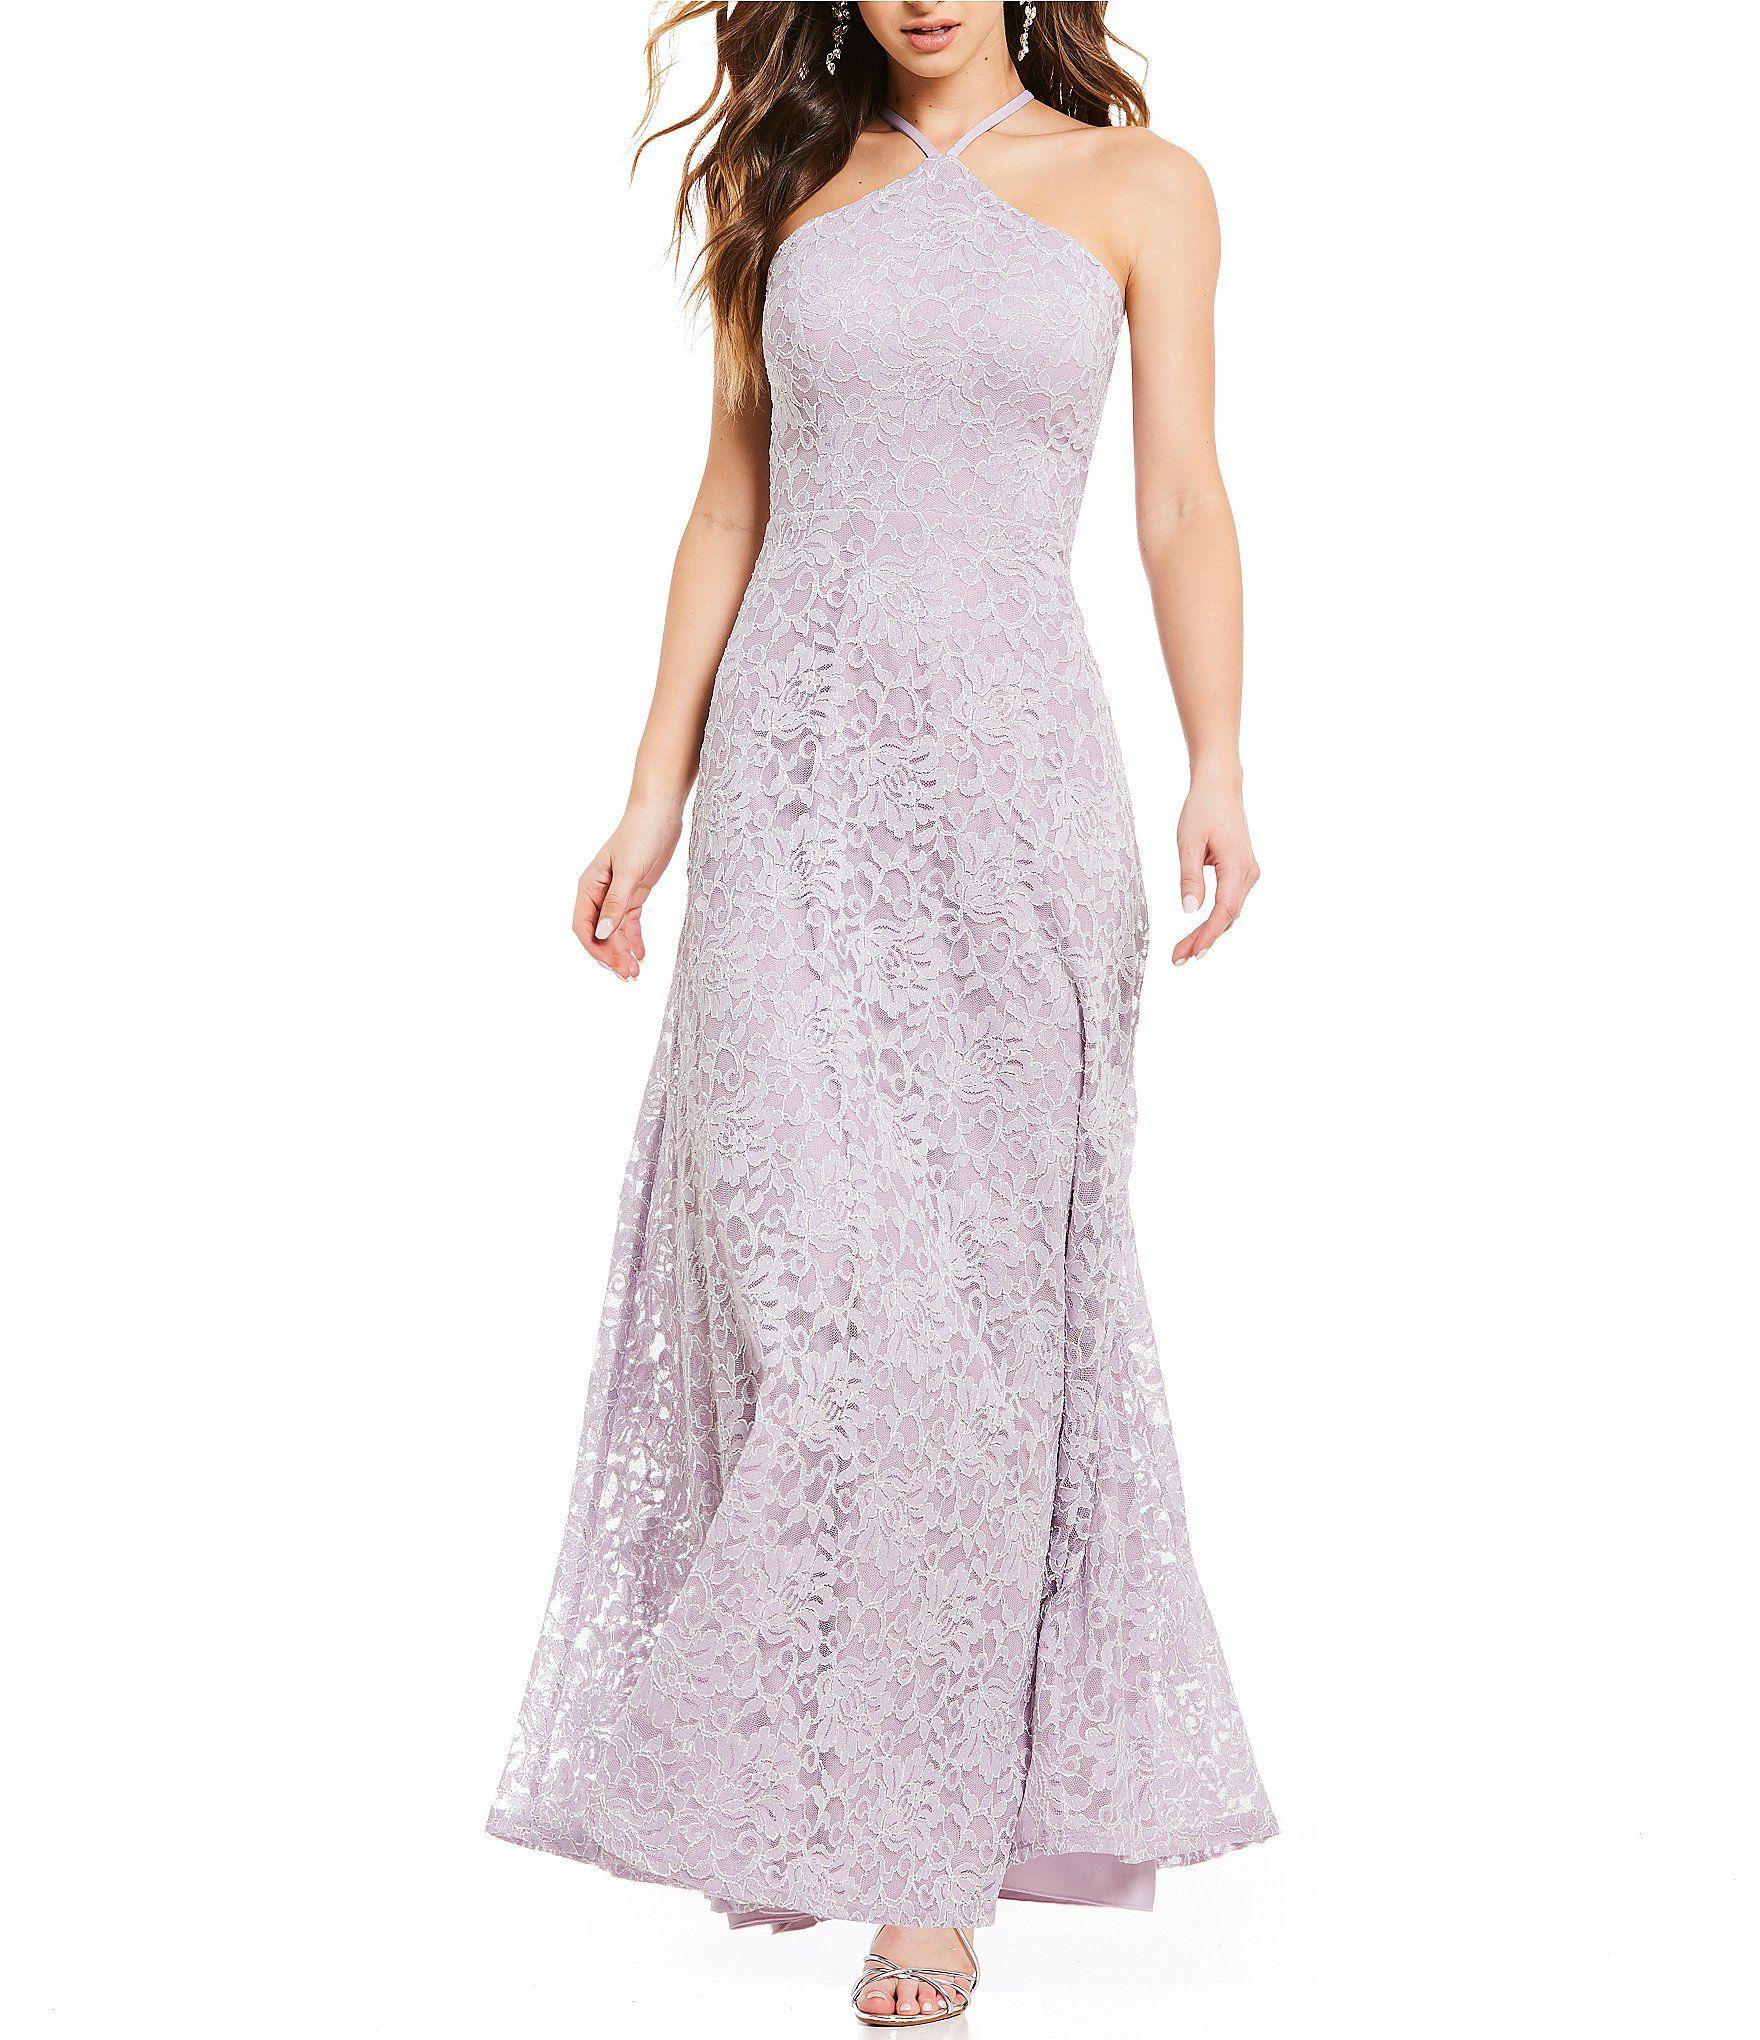 Shop for xtraordinary yneck lace long dress at dillards visit